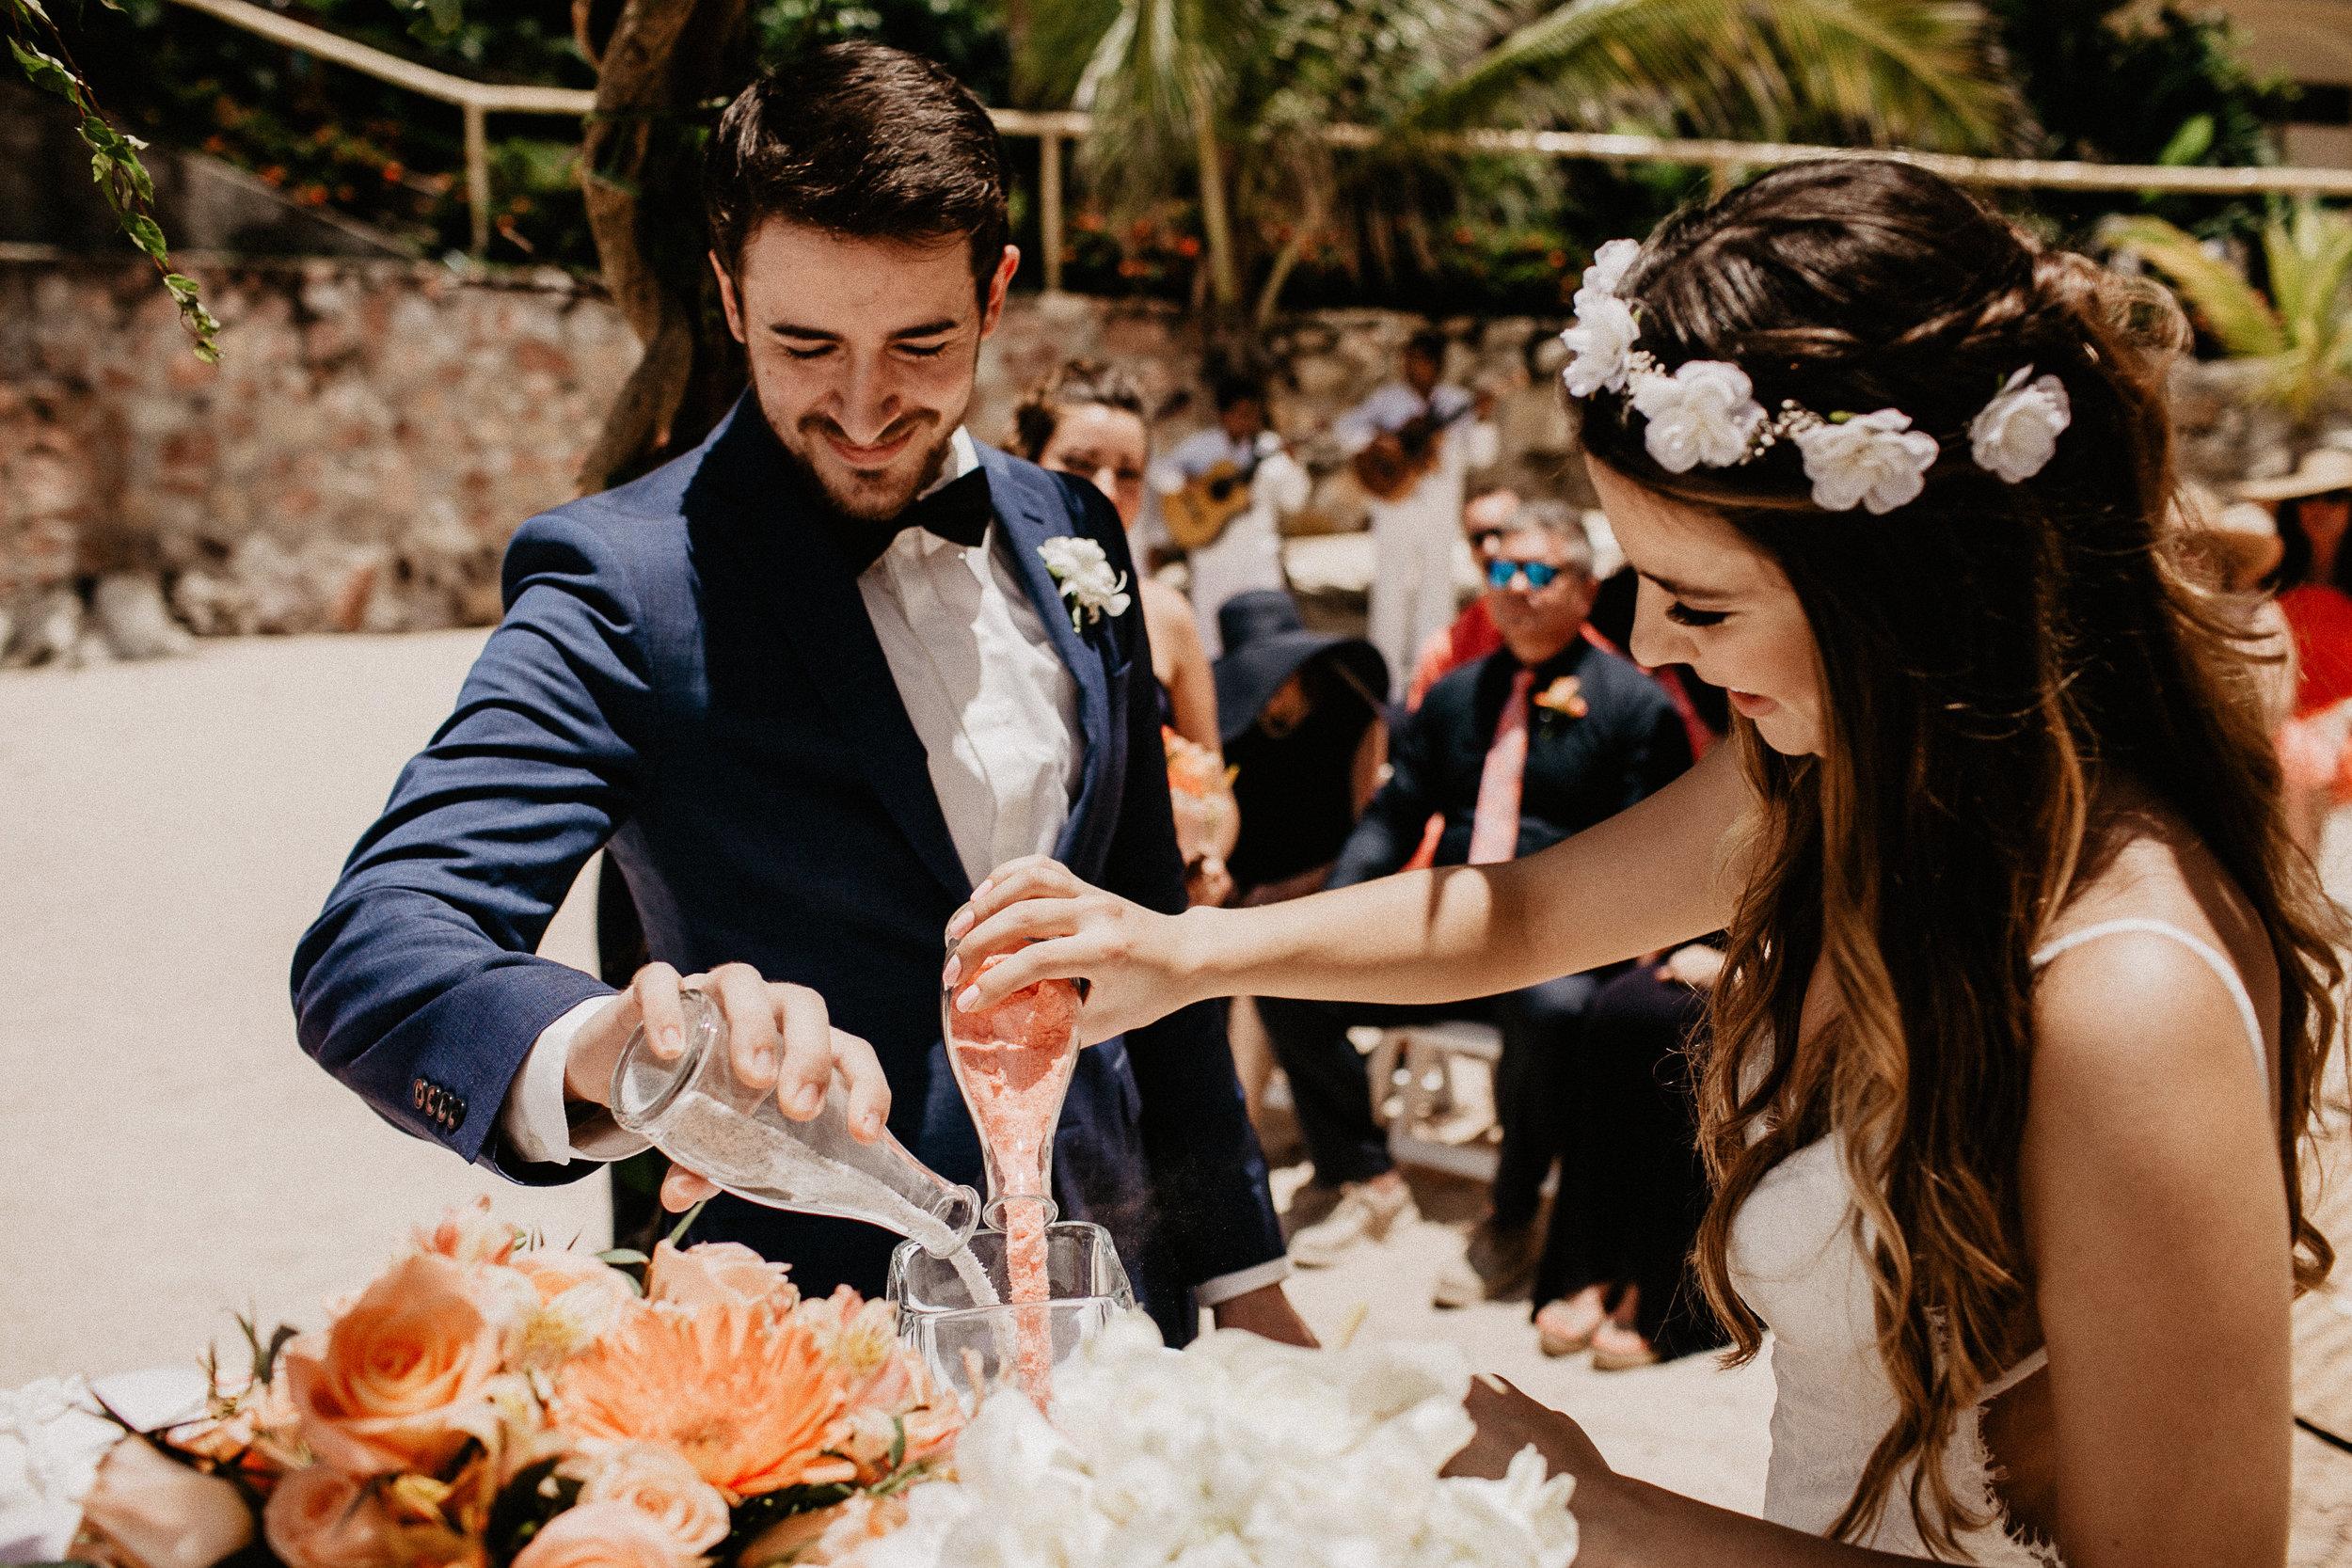 alfonso_flores_destination_wedding_photography_puerto_vallarta_hotel_barcelo_vallarta_cuttler_amela-249.JPG